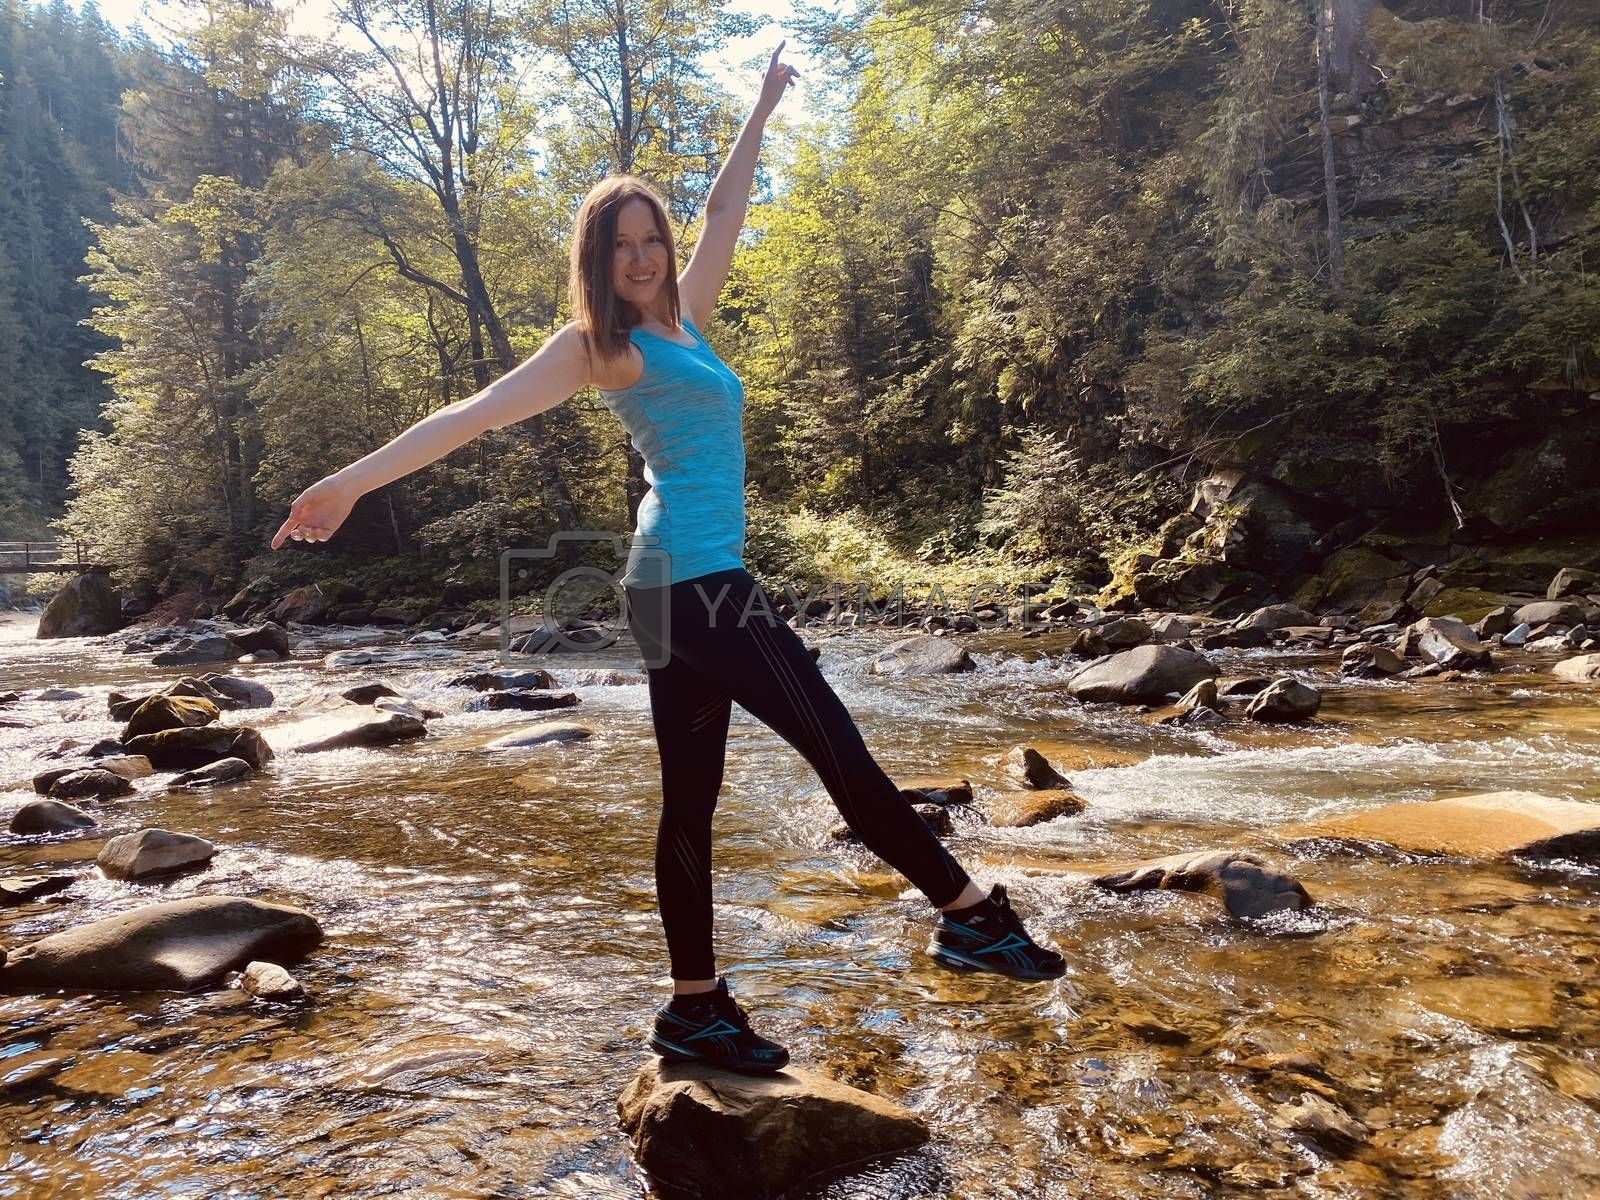 young woman doing yoga exercises on the stone among mountain stream